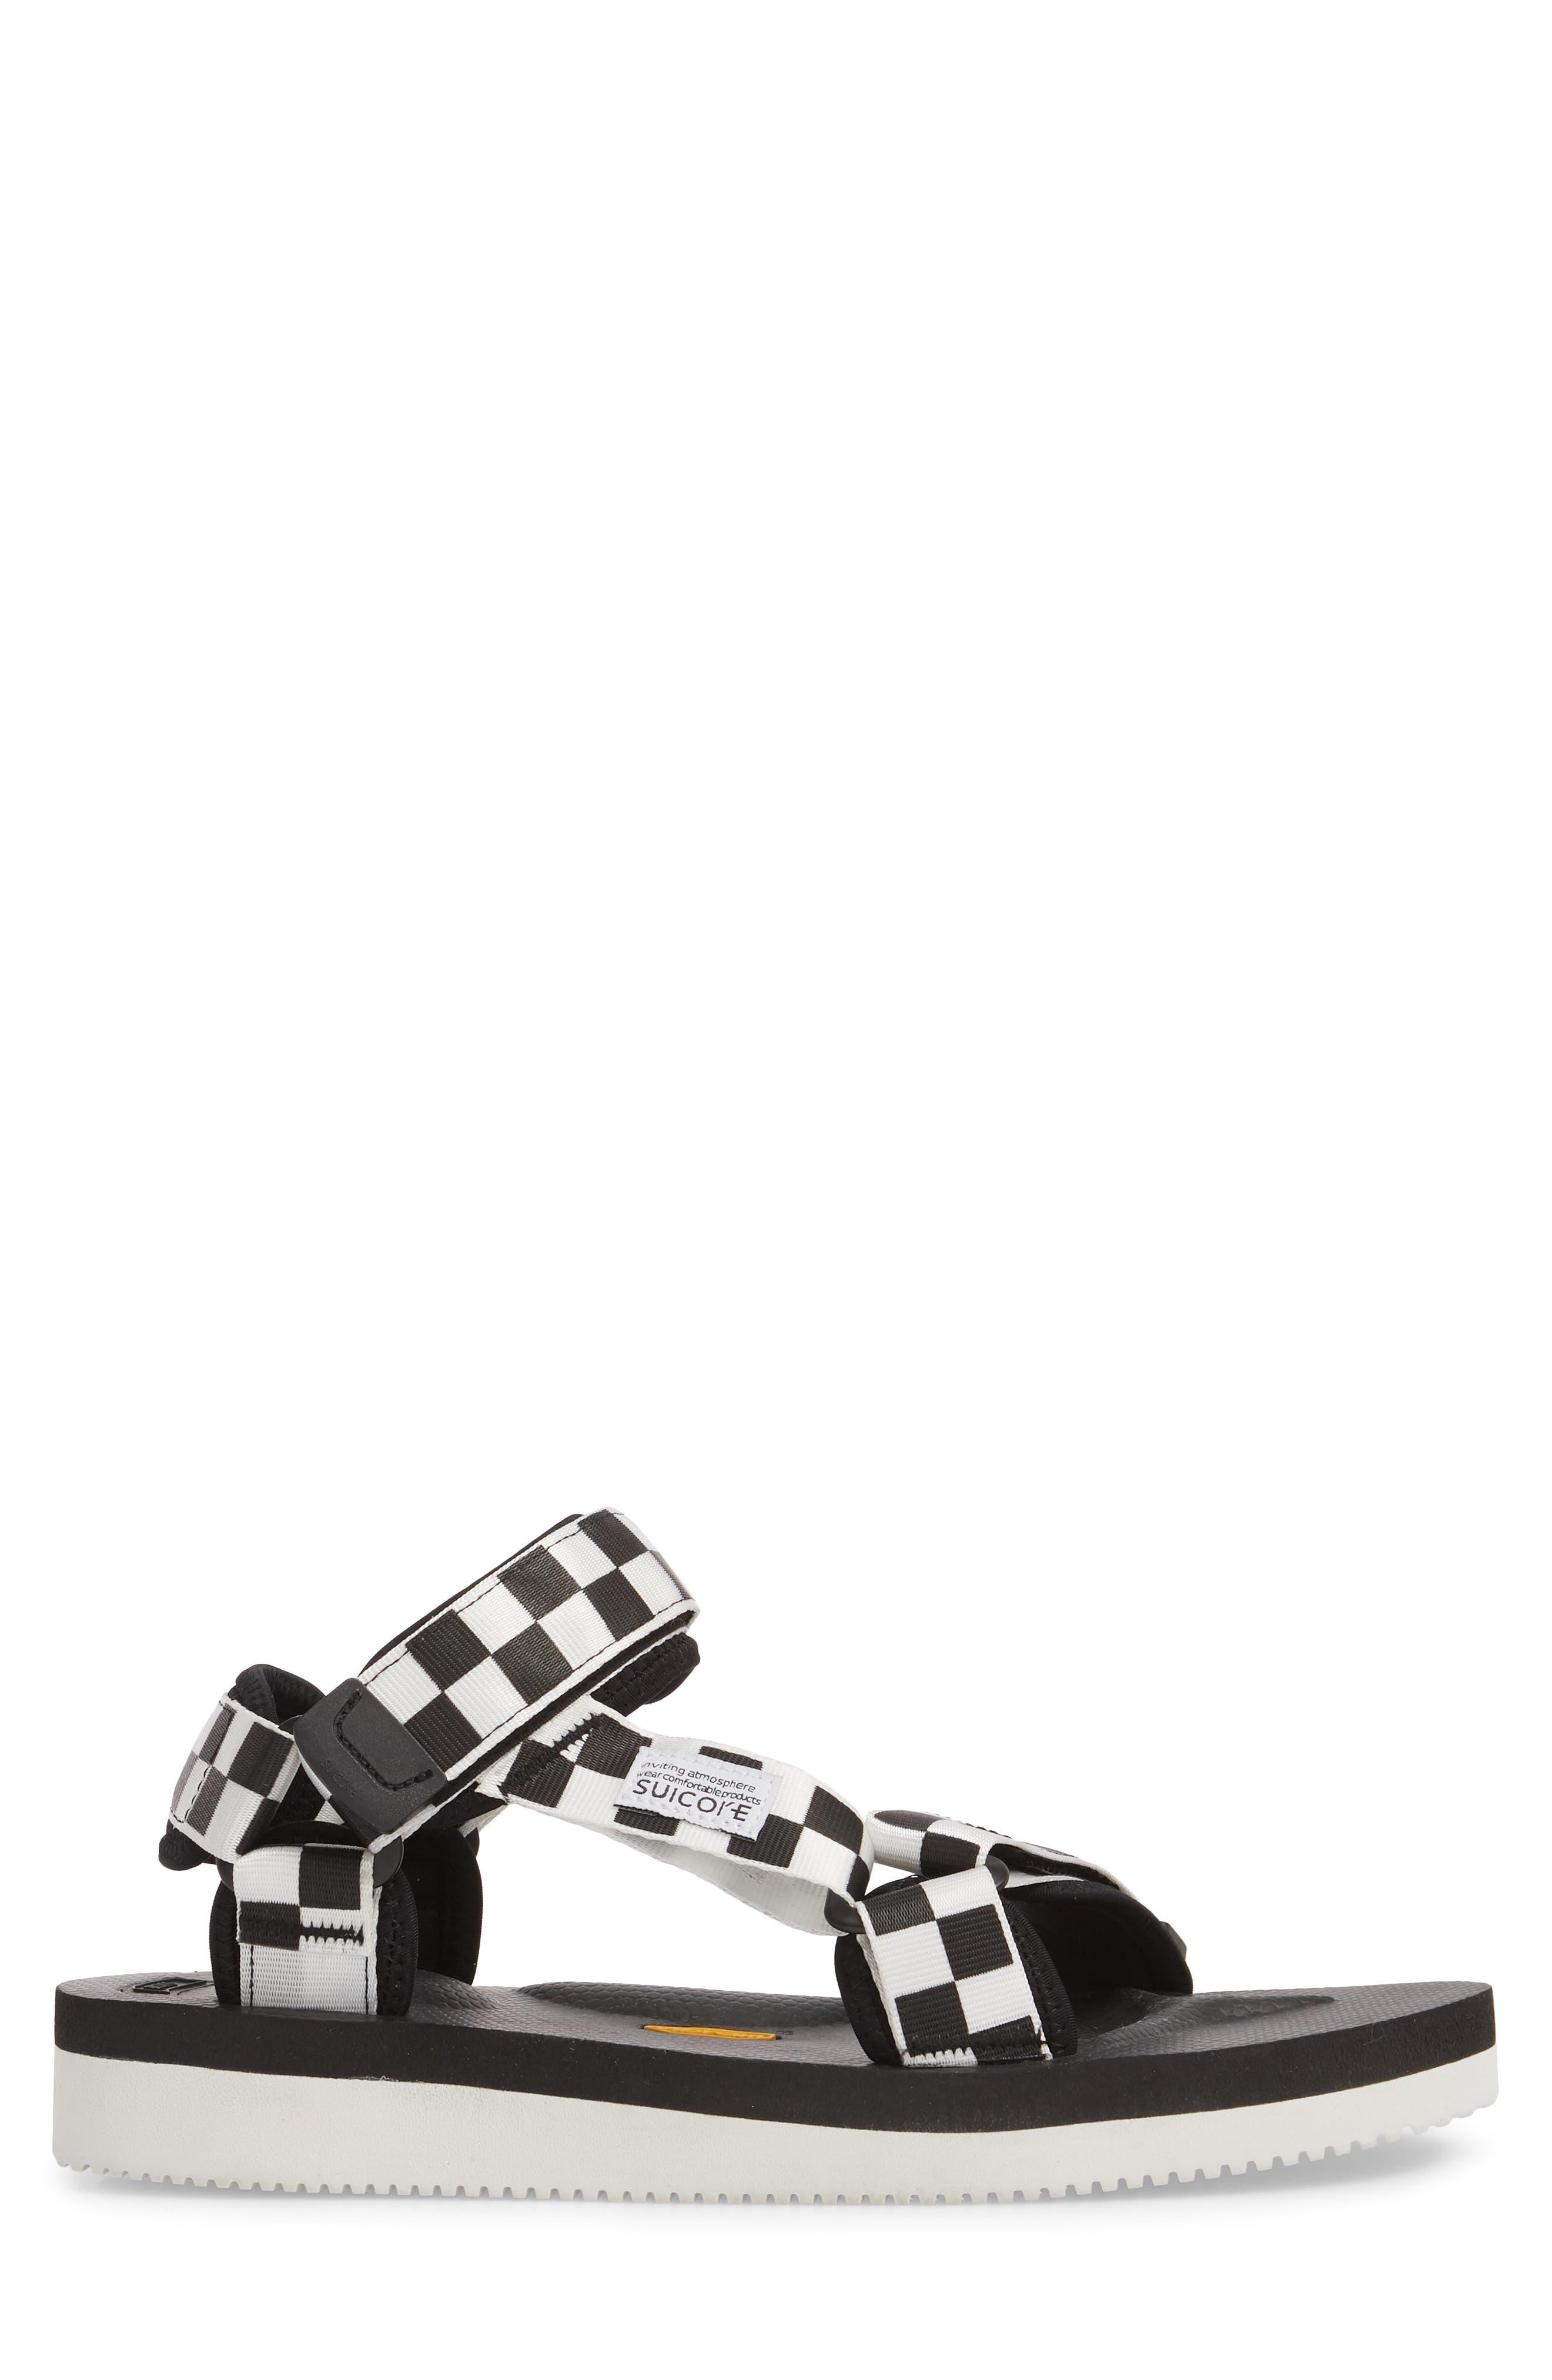 Depa Sport Sandal,                             Alternate thumbnail 3, color,                             BLACK